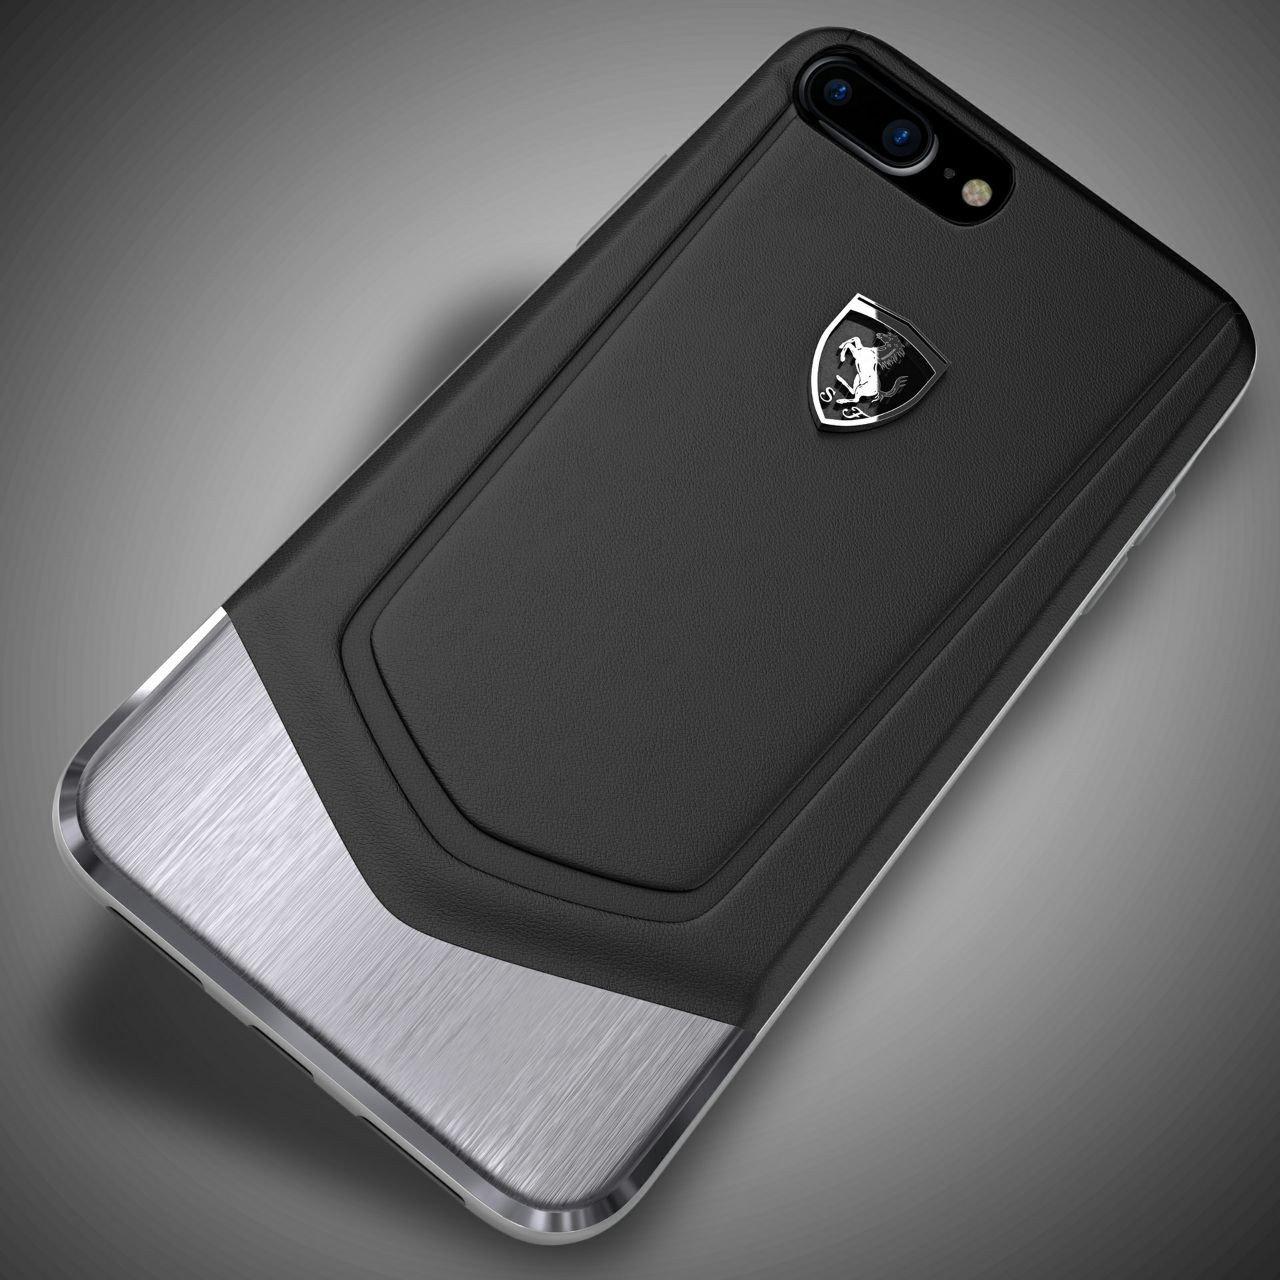 Aliexpress.com : Buy For iPhone X Case Carbon Fiber Cover